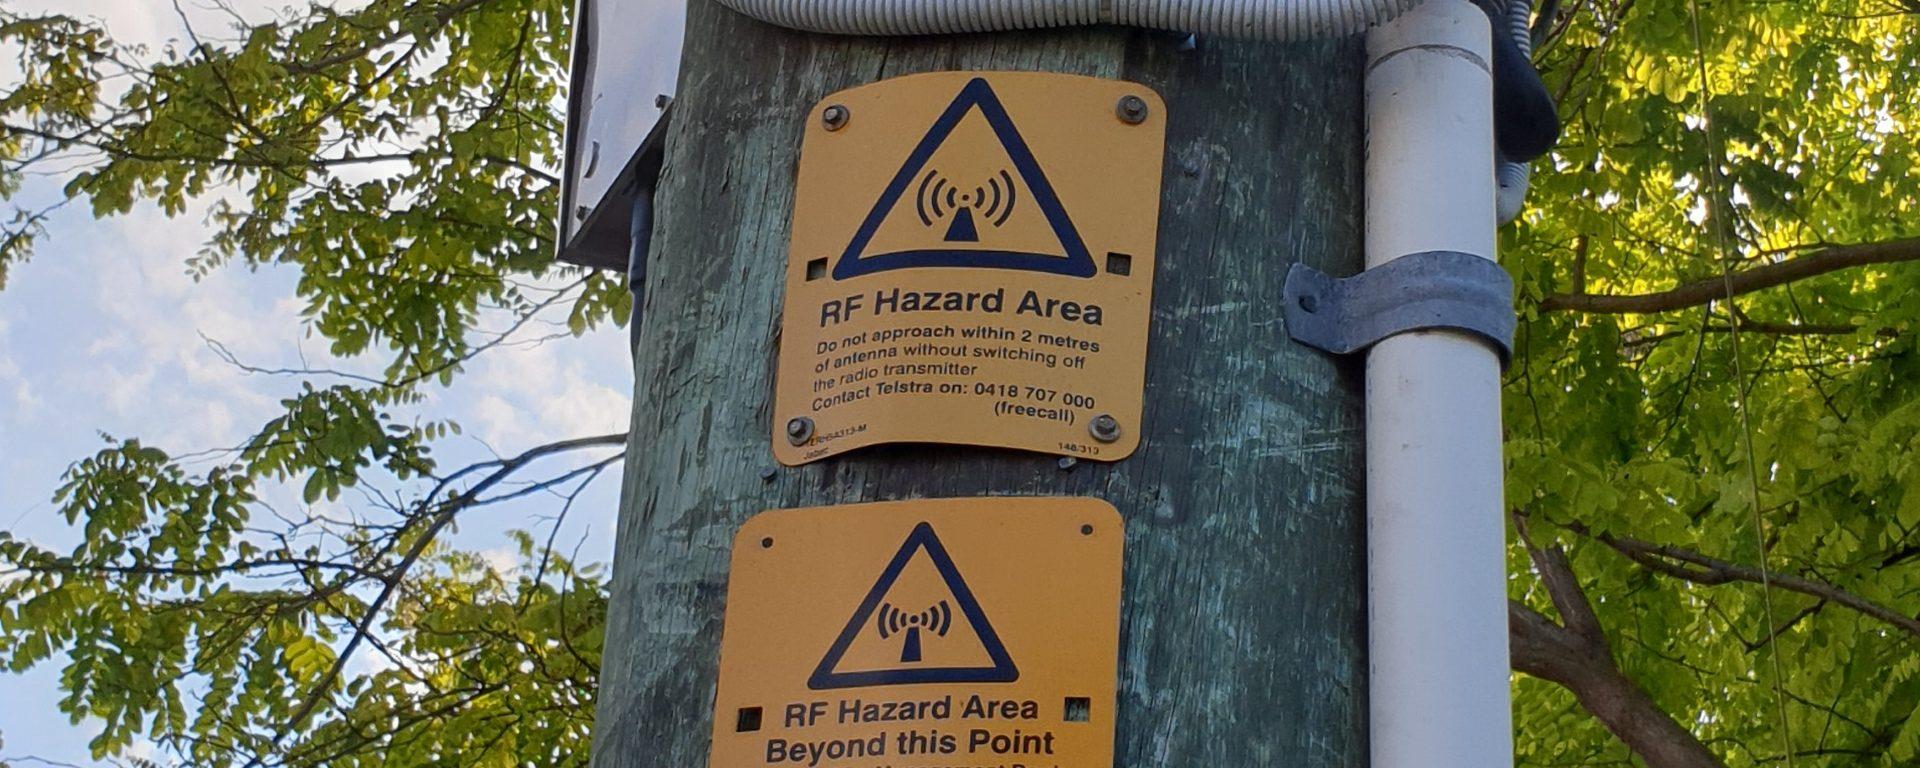 5G RF warnings